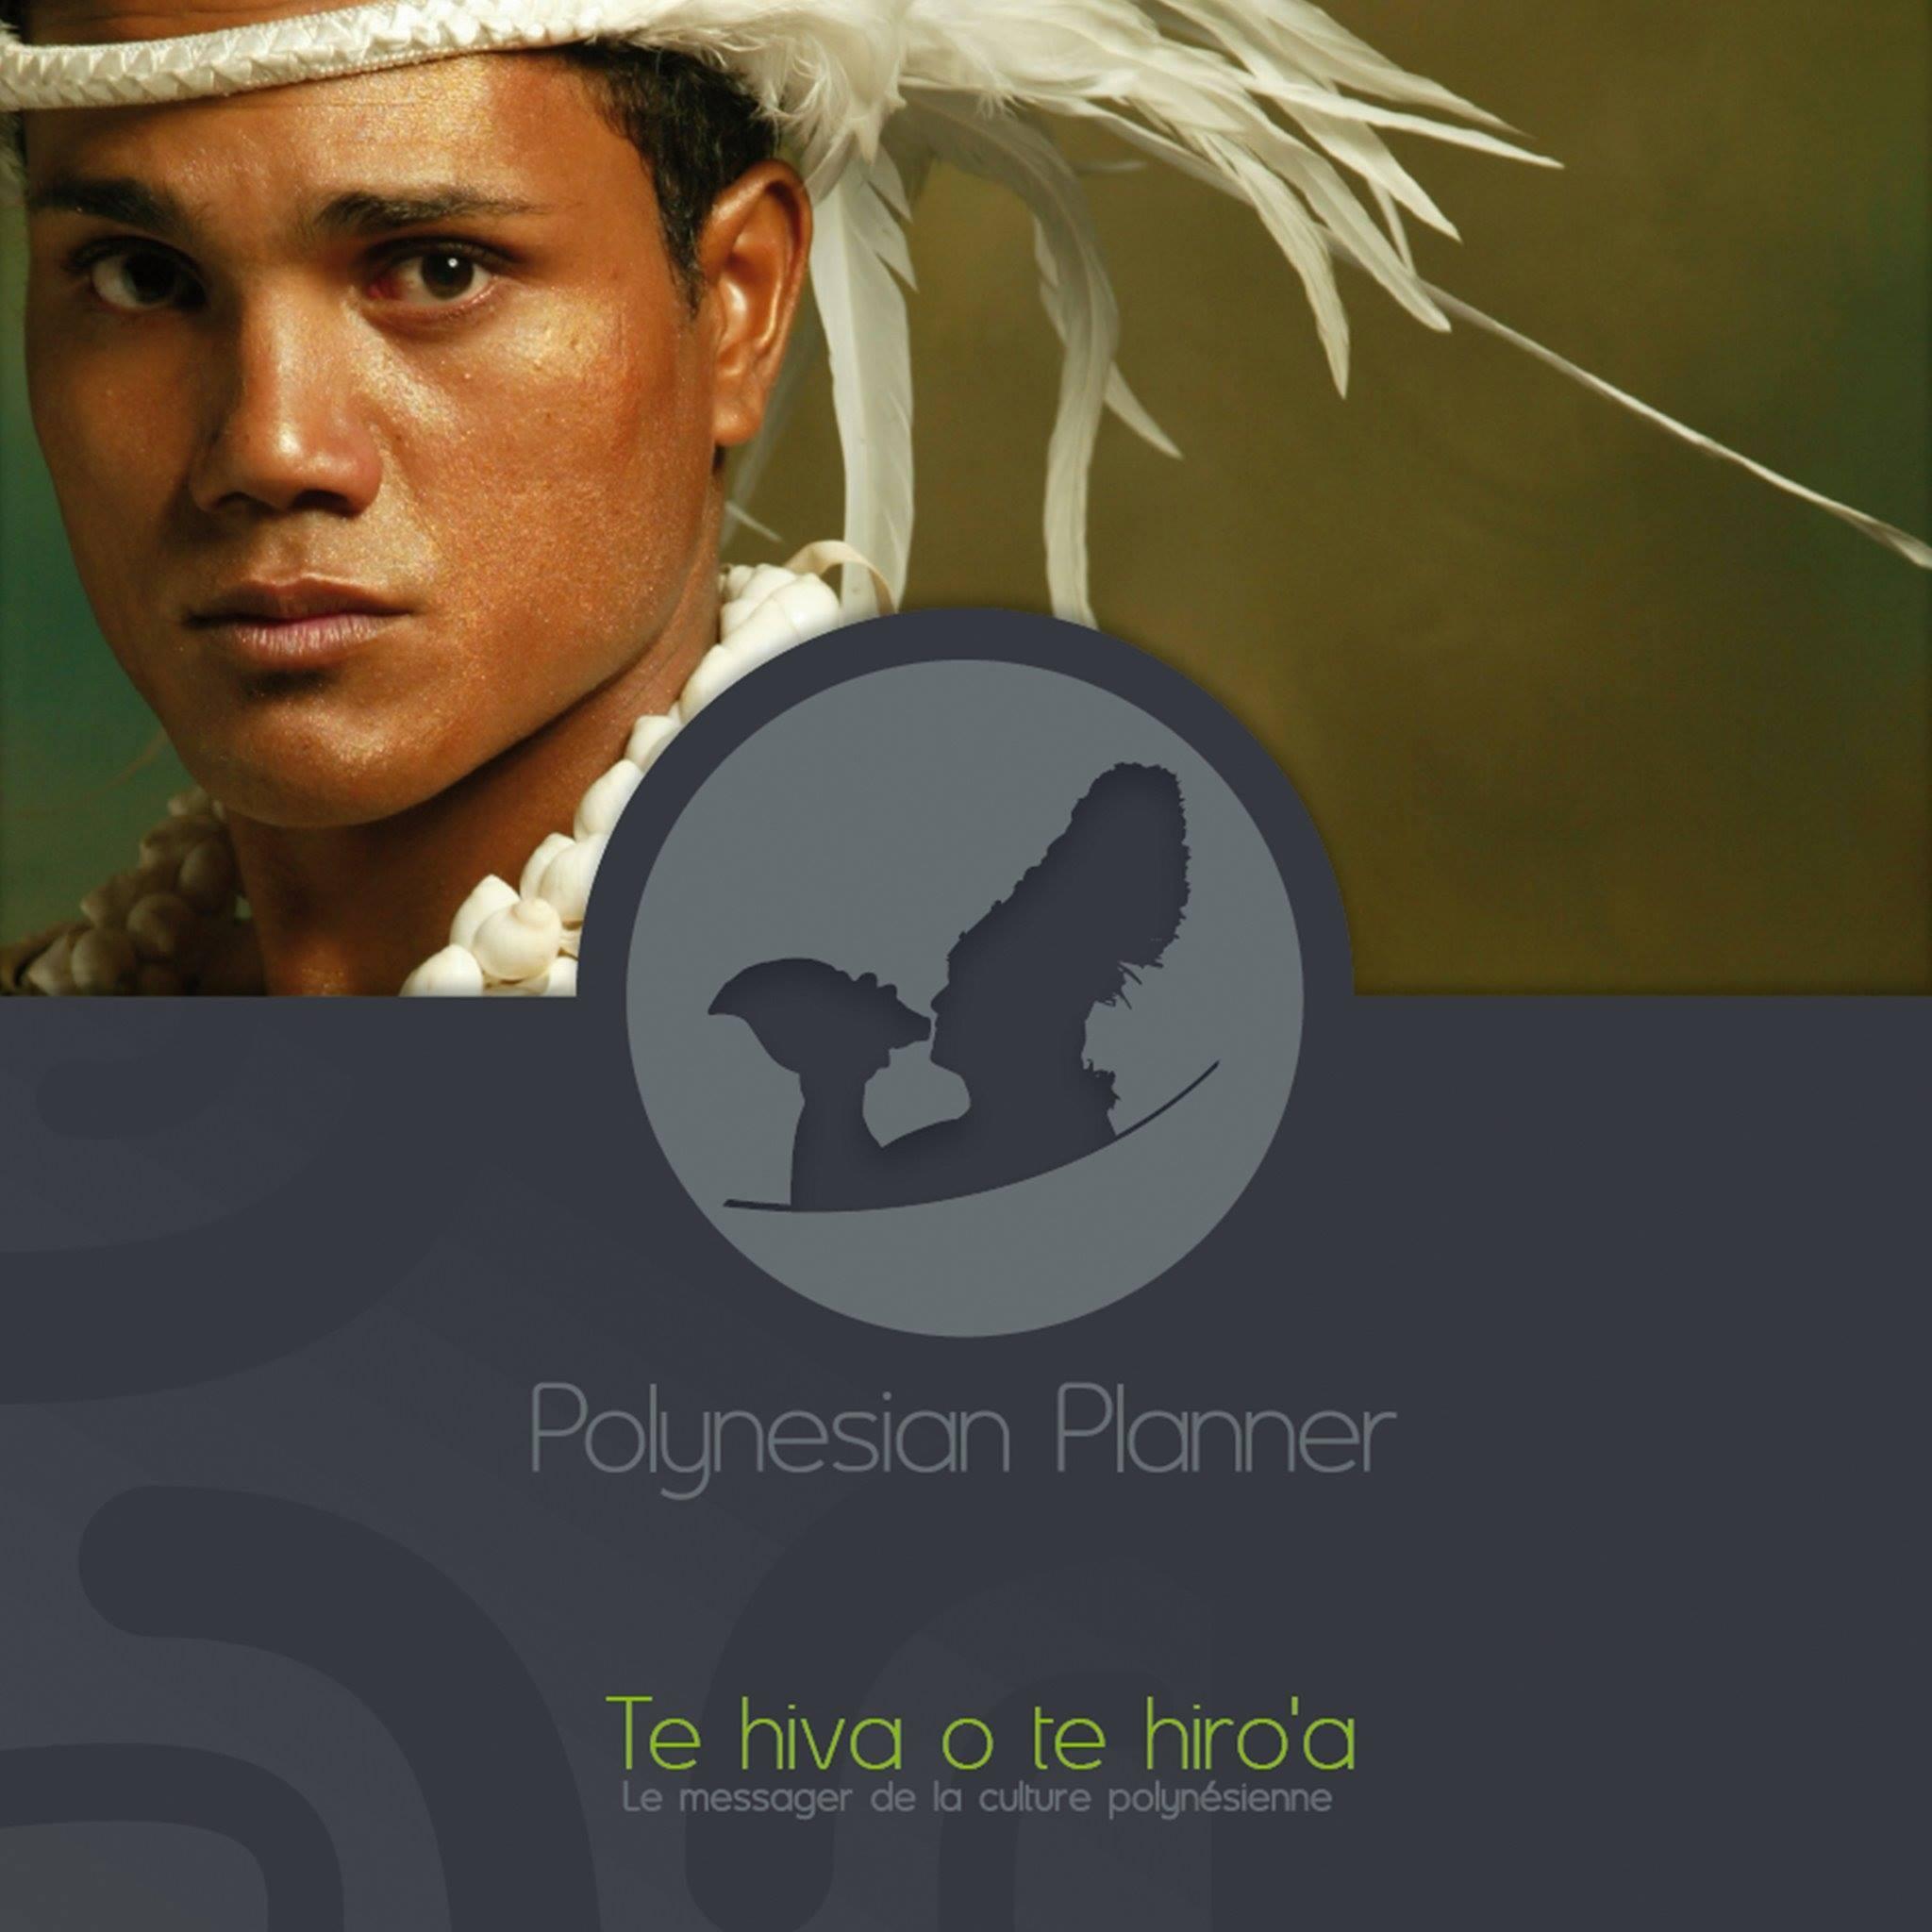 https://tahititourisme.fr/wp-content/uploads/2017/08/polynesianplannerphotodeprofil.jpg